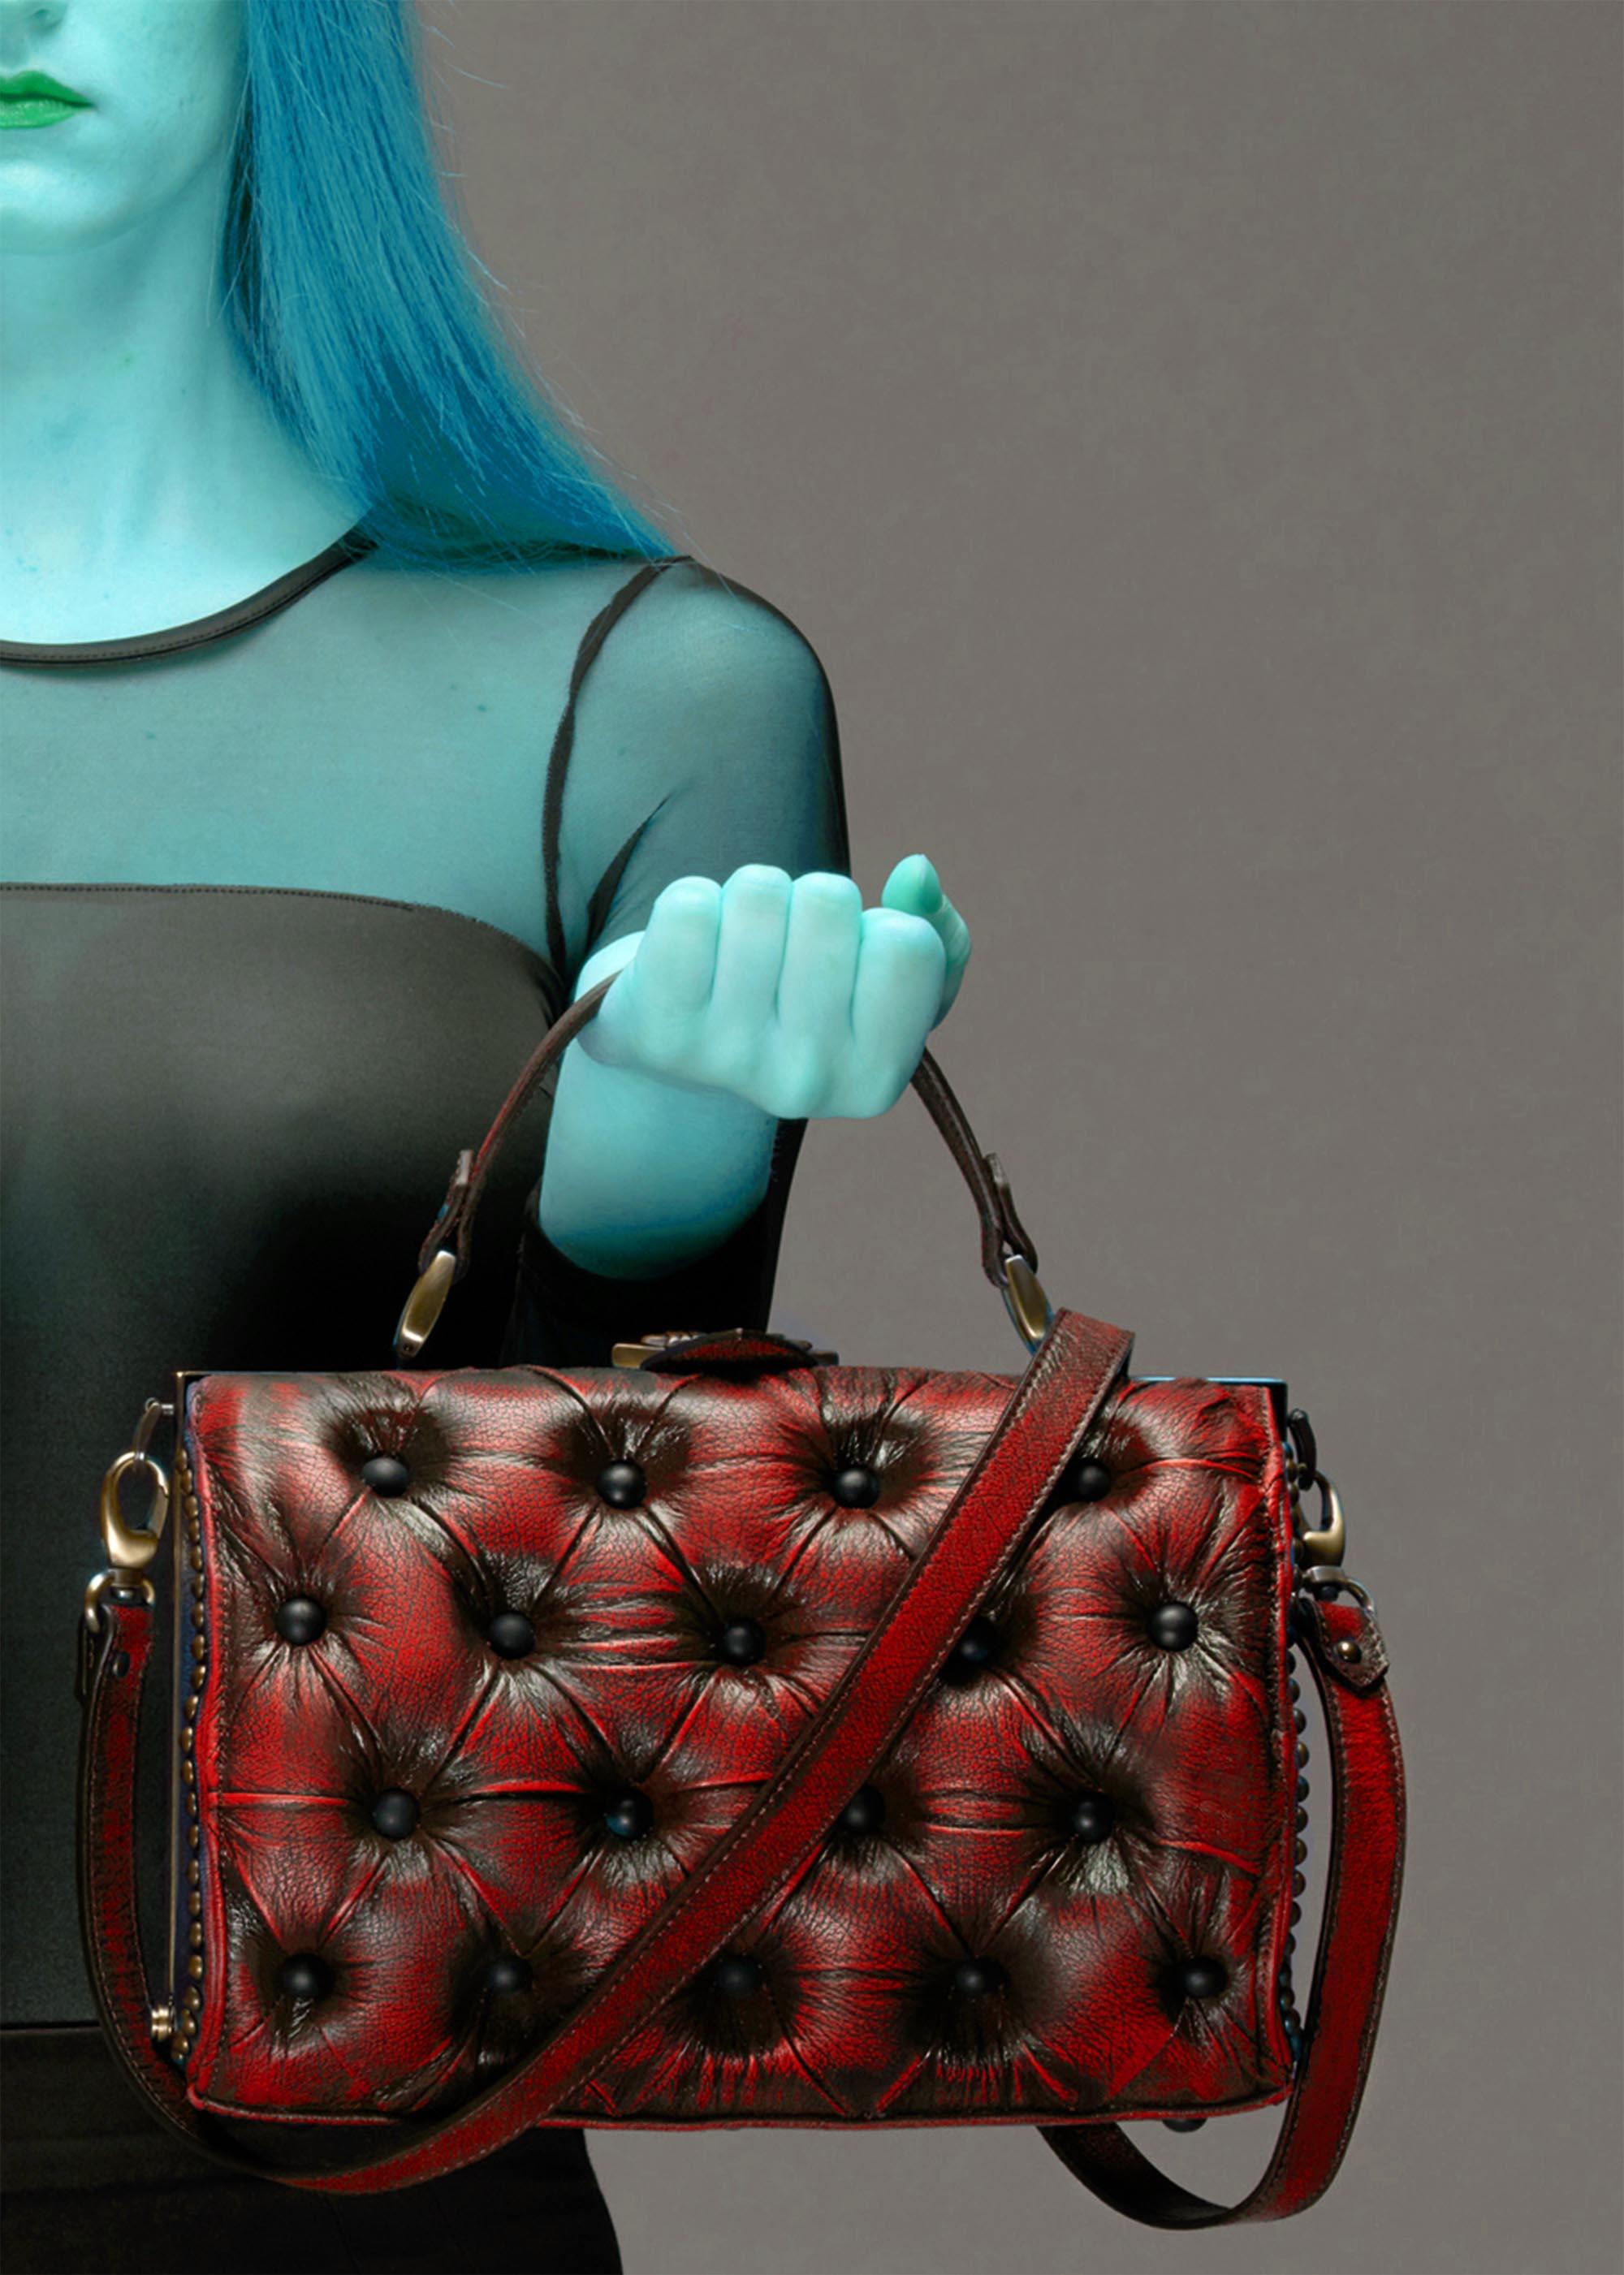 harleq bag leather red